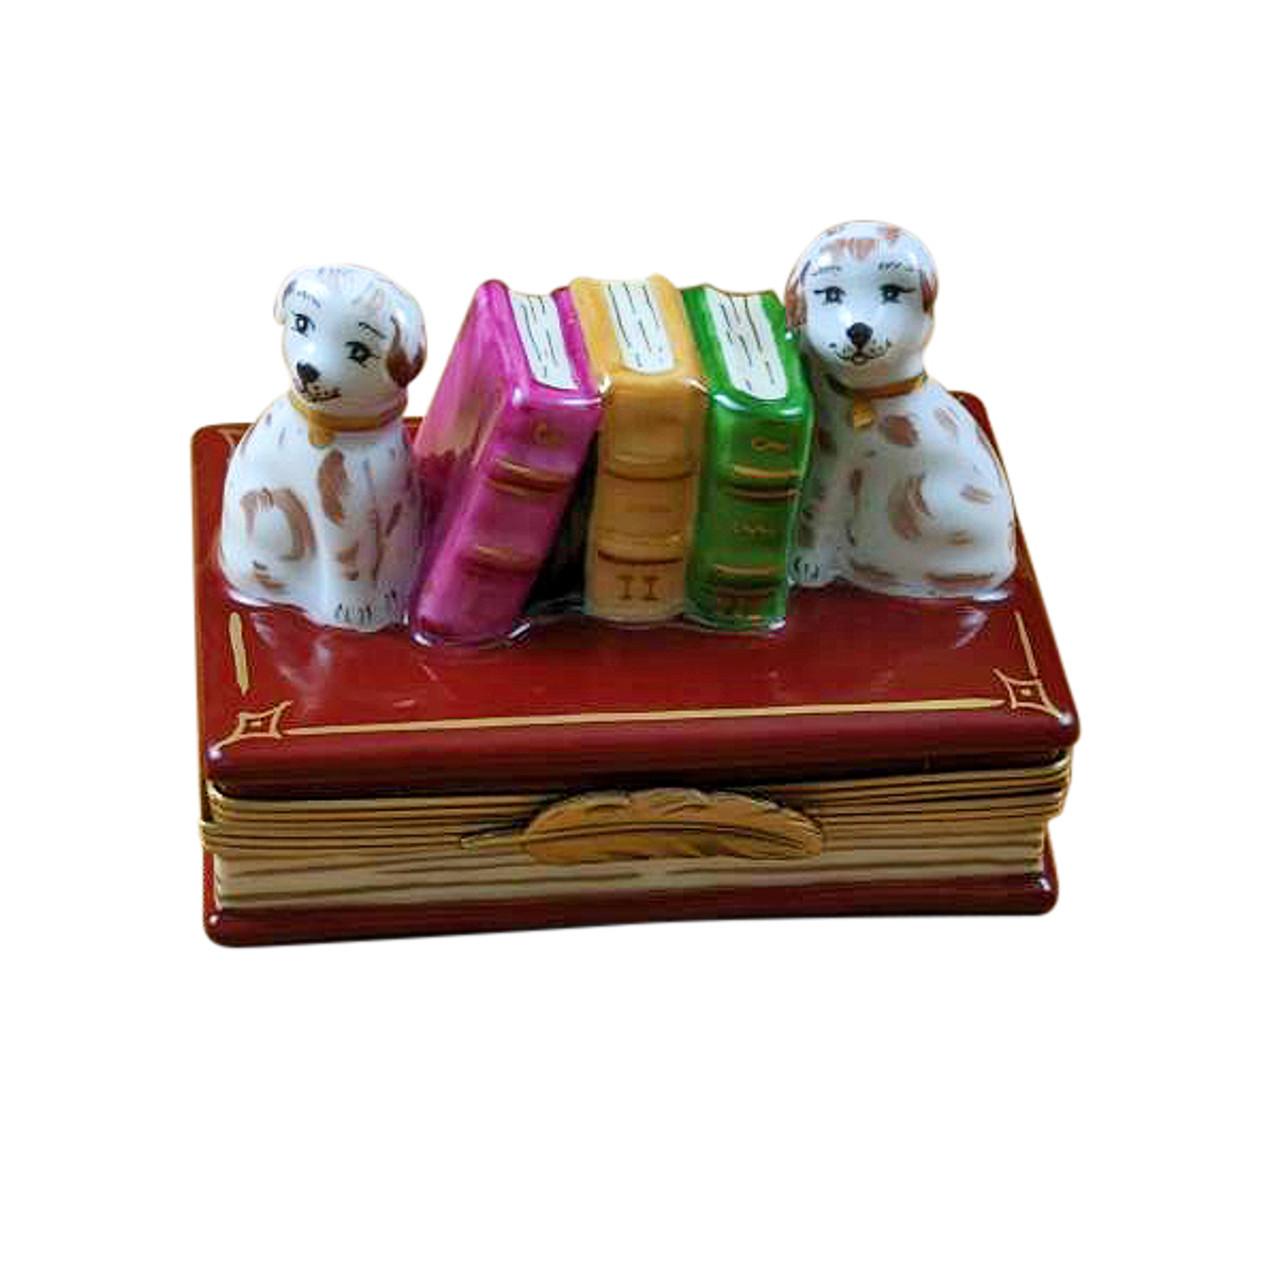 DOG BOOKENDS Rochard Limoges Box RN053-I